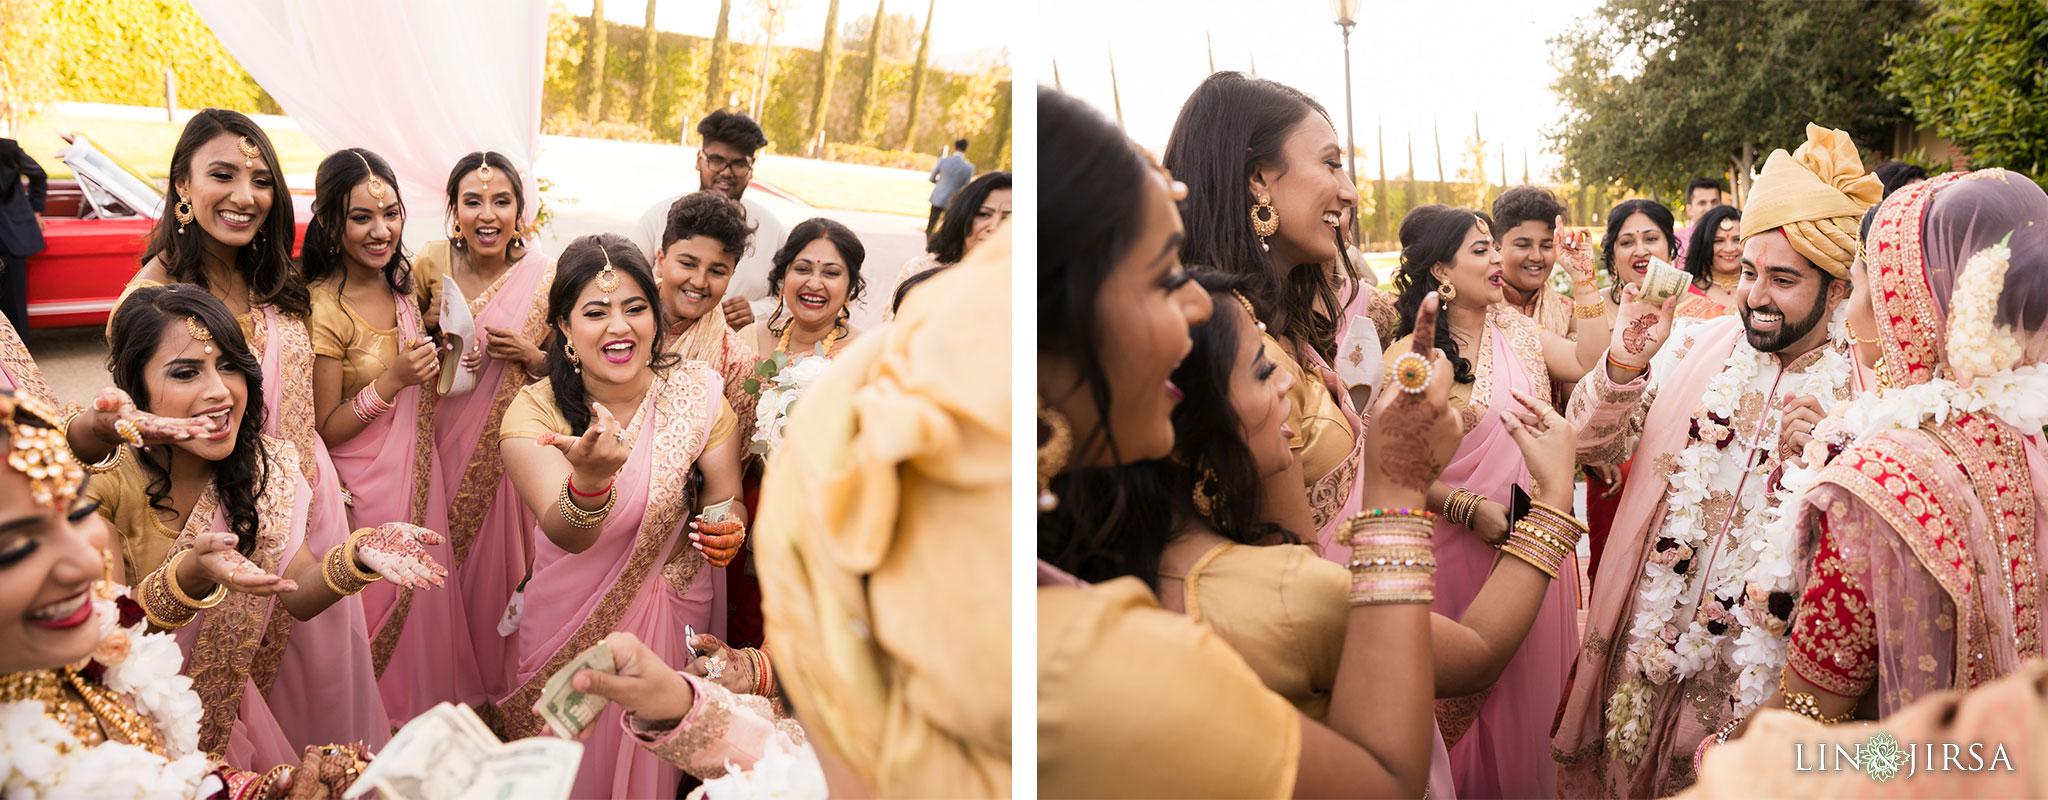 39 four seasons westlake village indian wedding photography